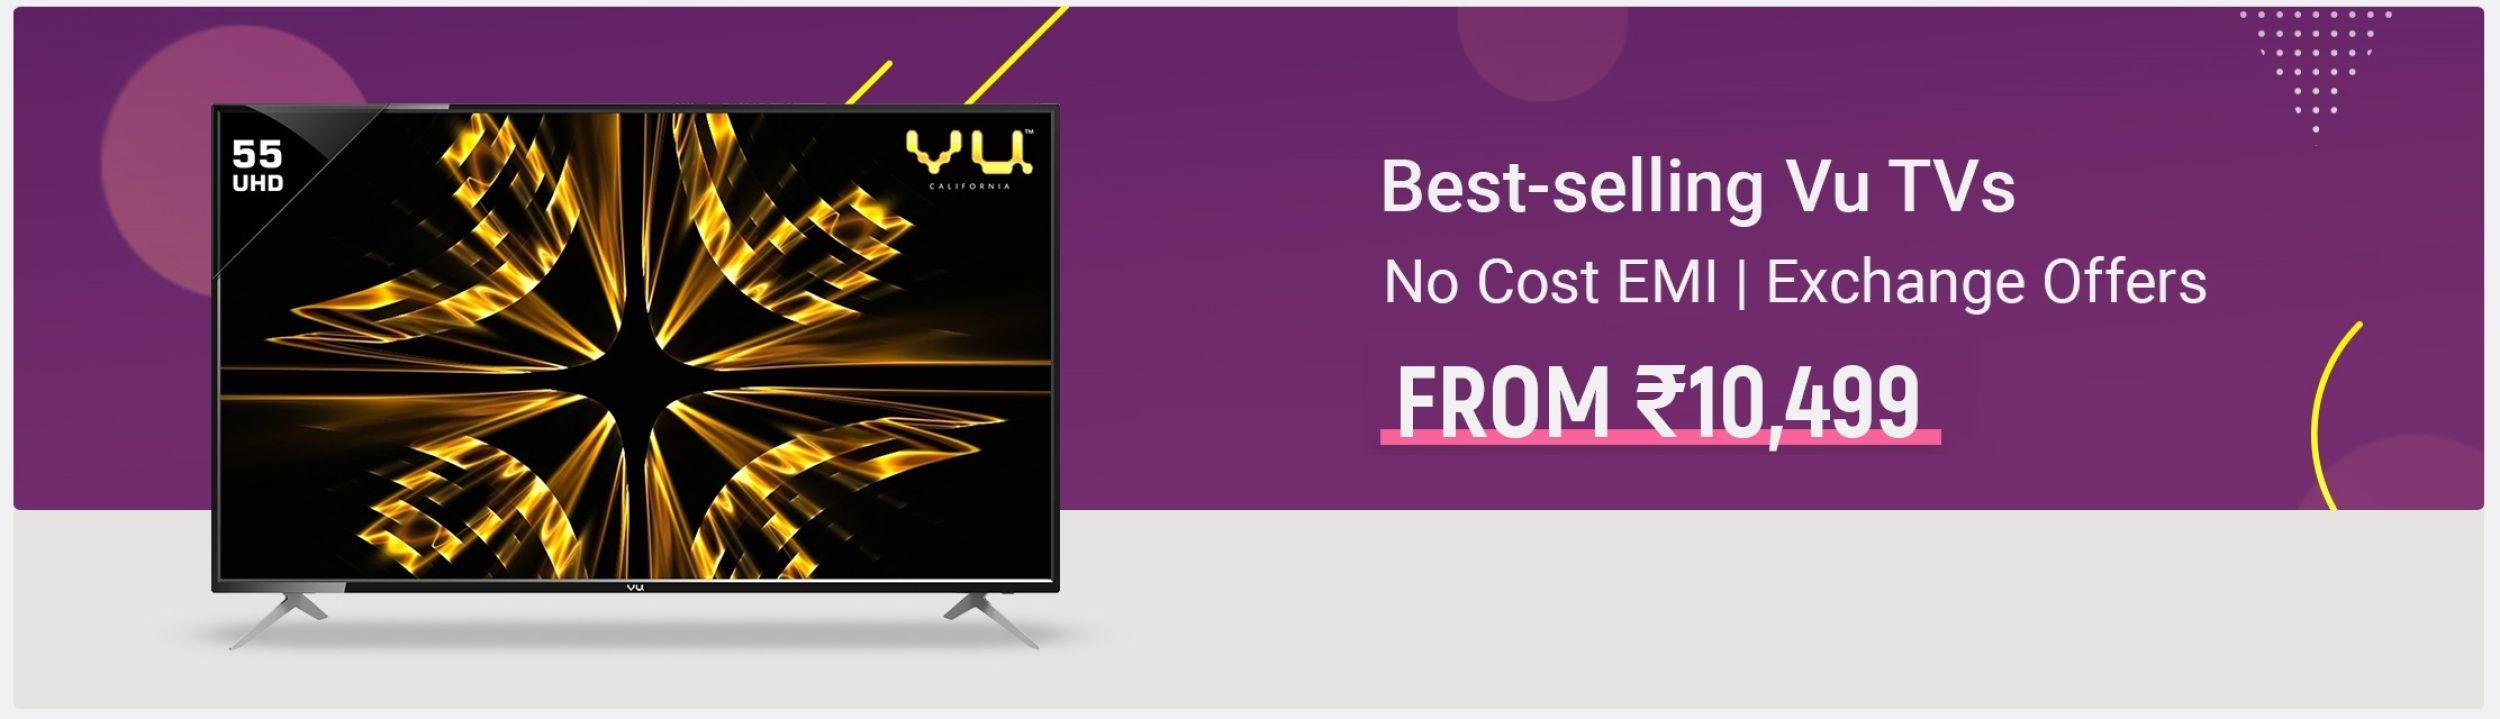 TV-CLP-VuBestSelling-banner